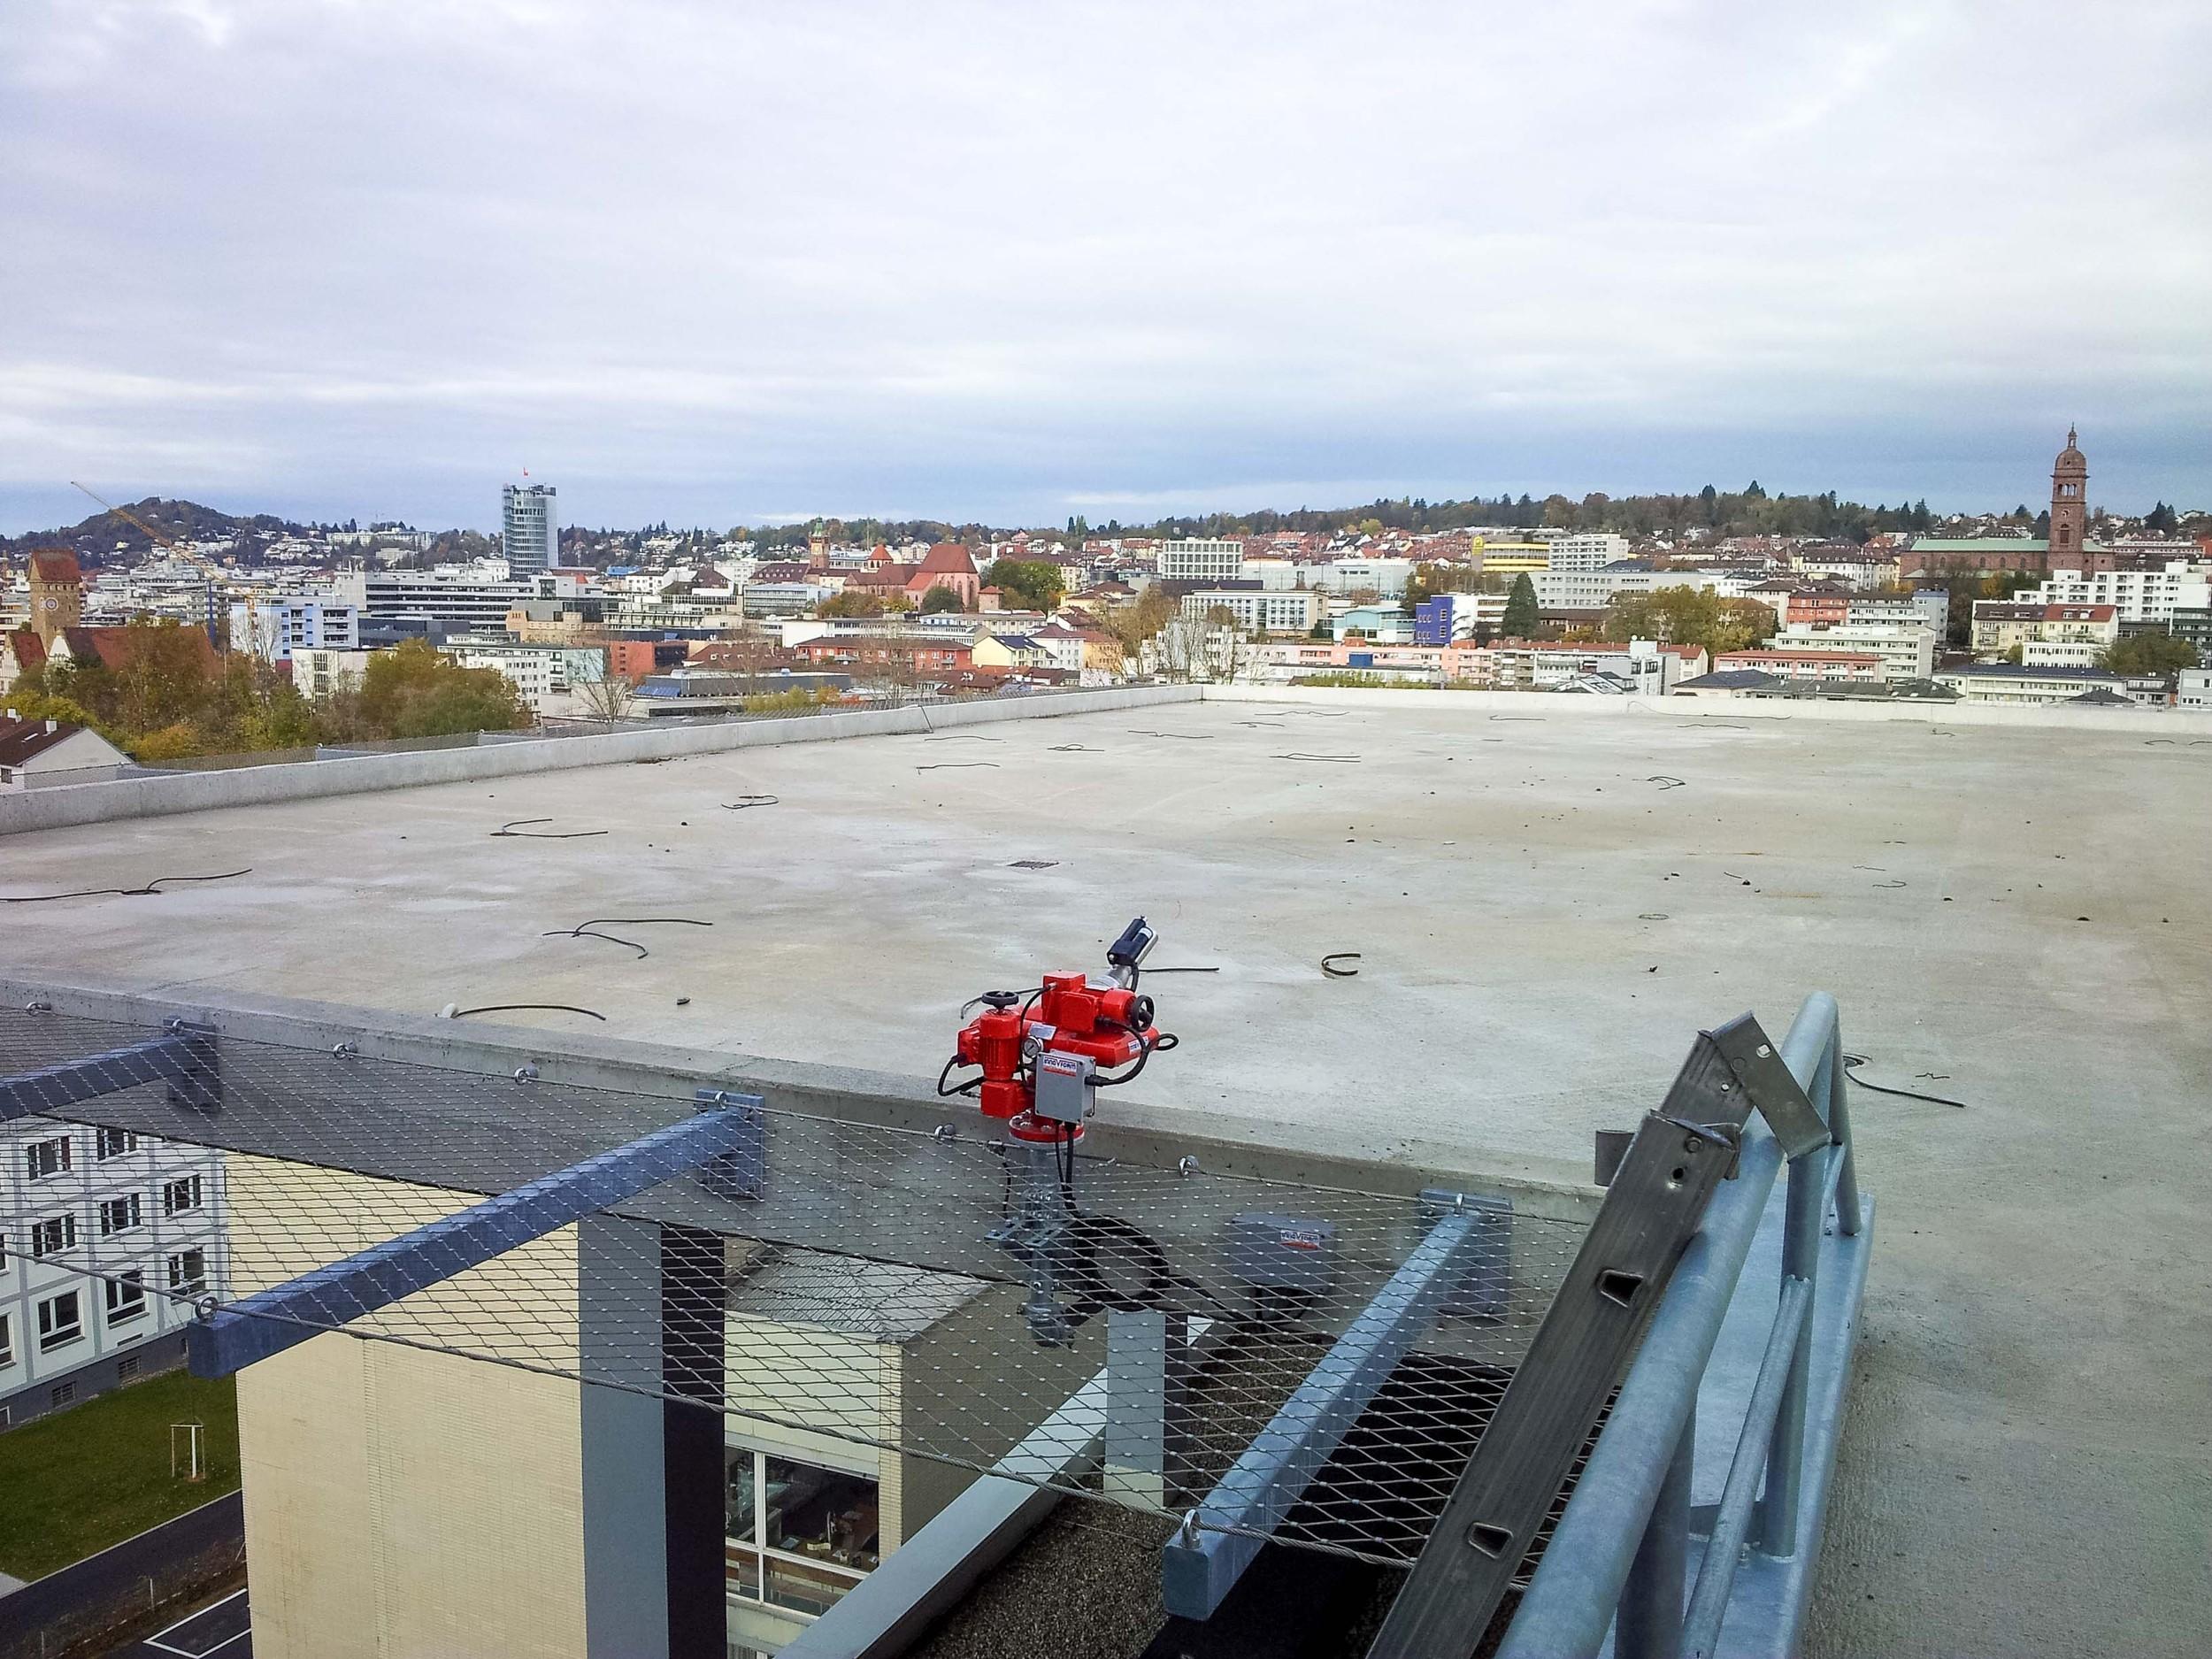 Geslaagde oplevering helidecksysteem in Pforzheim